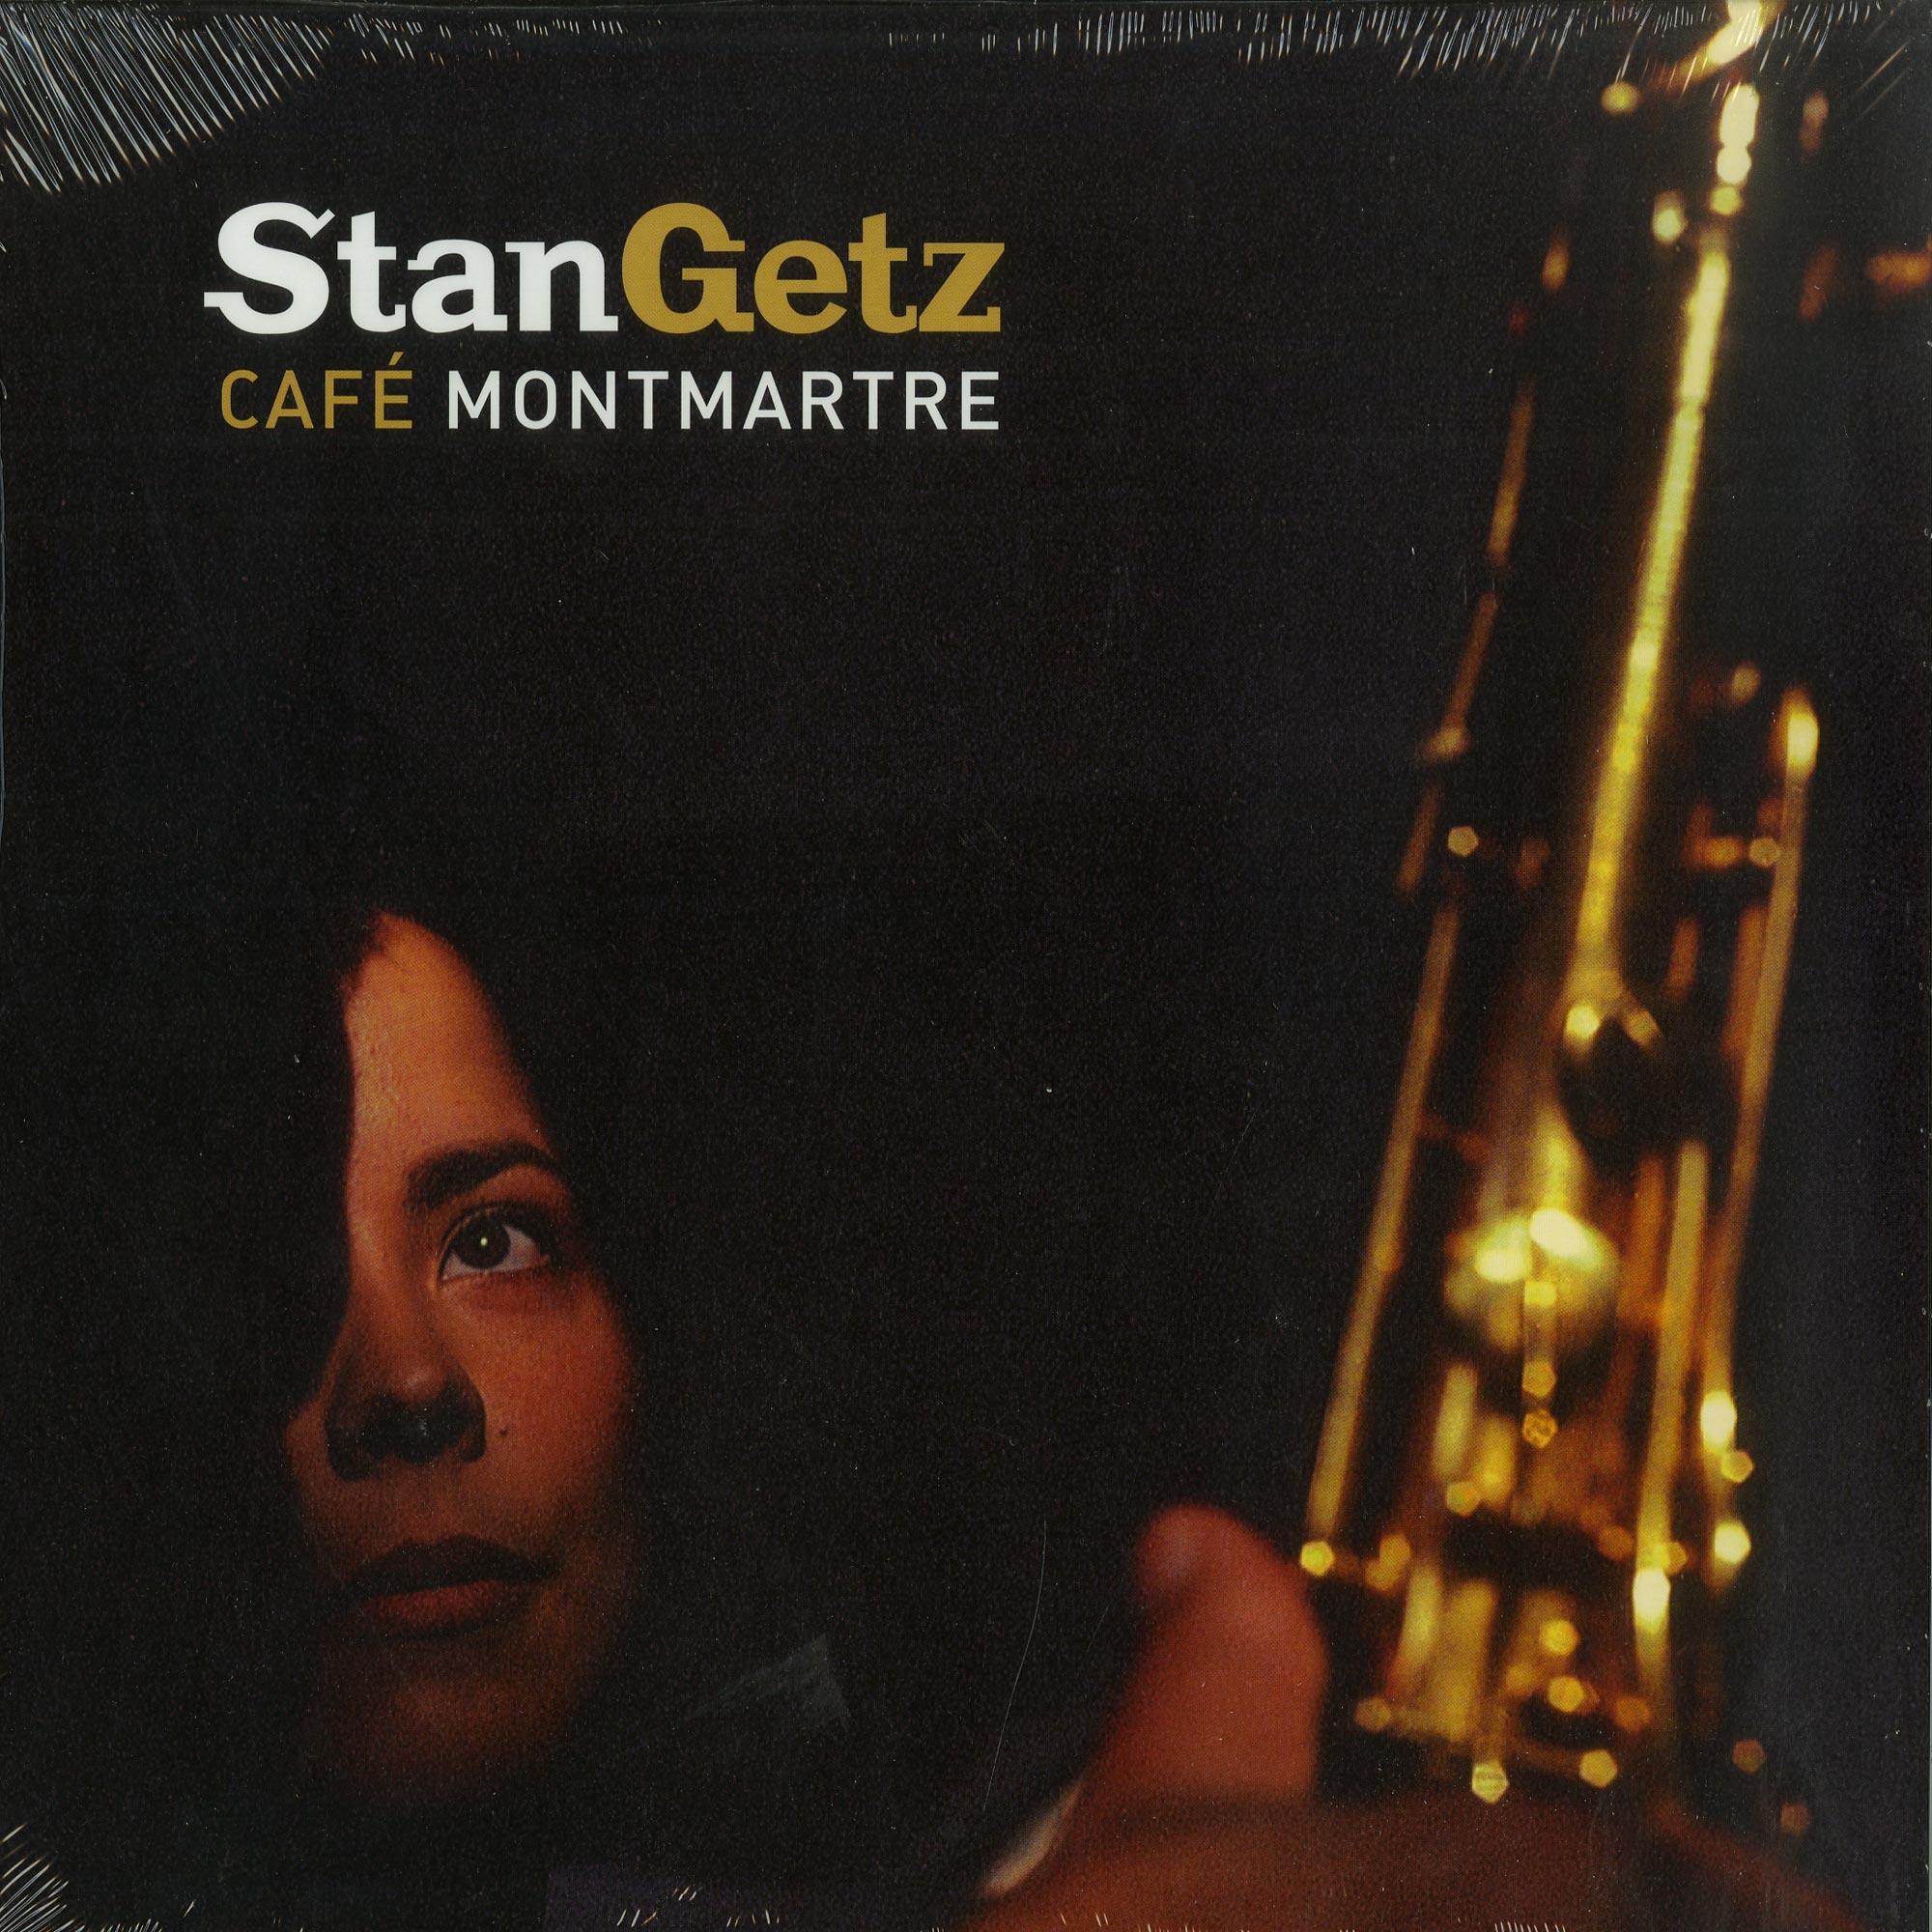 Stan Getz & Kenny Baron - CAFE MONTMARTRE